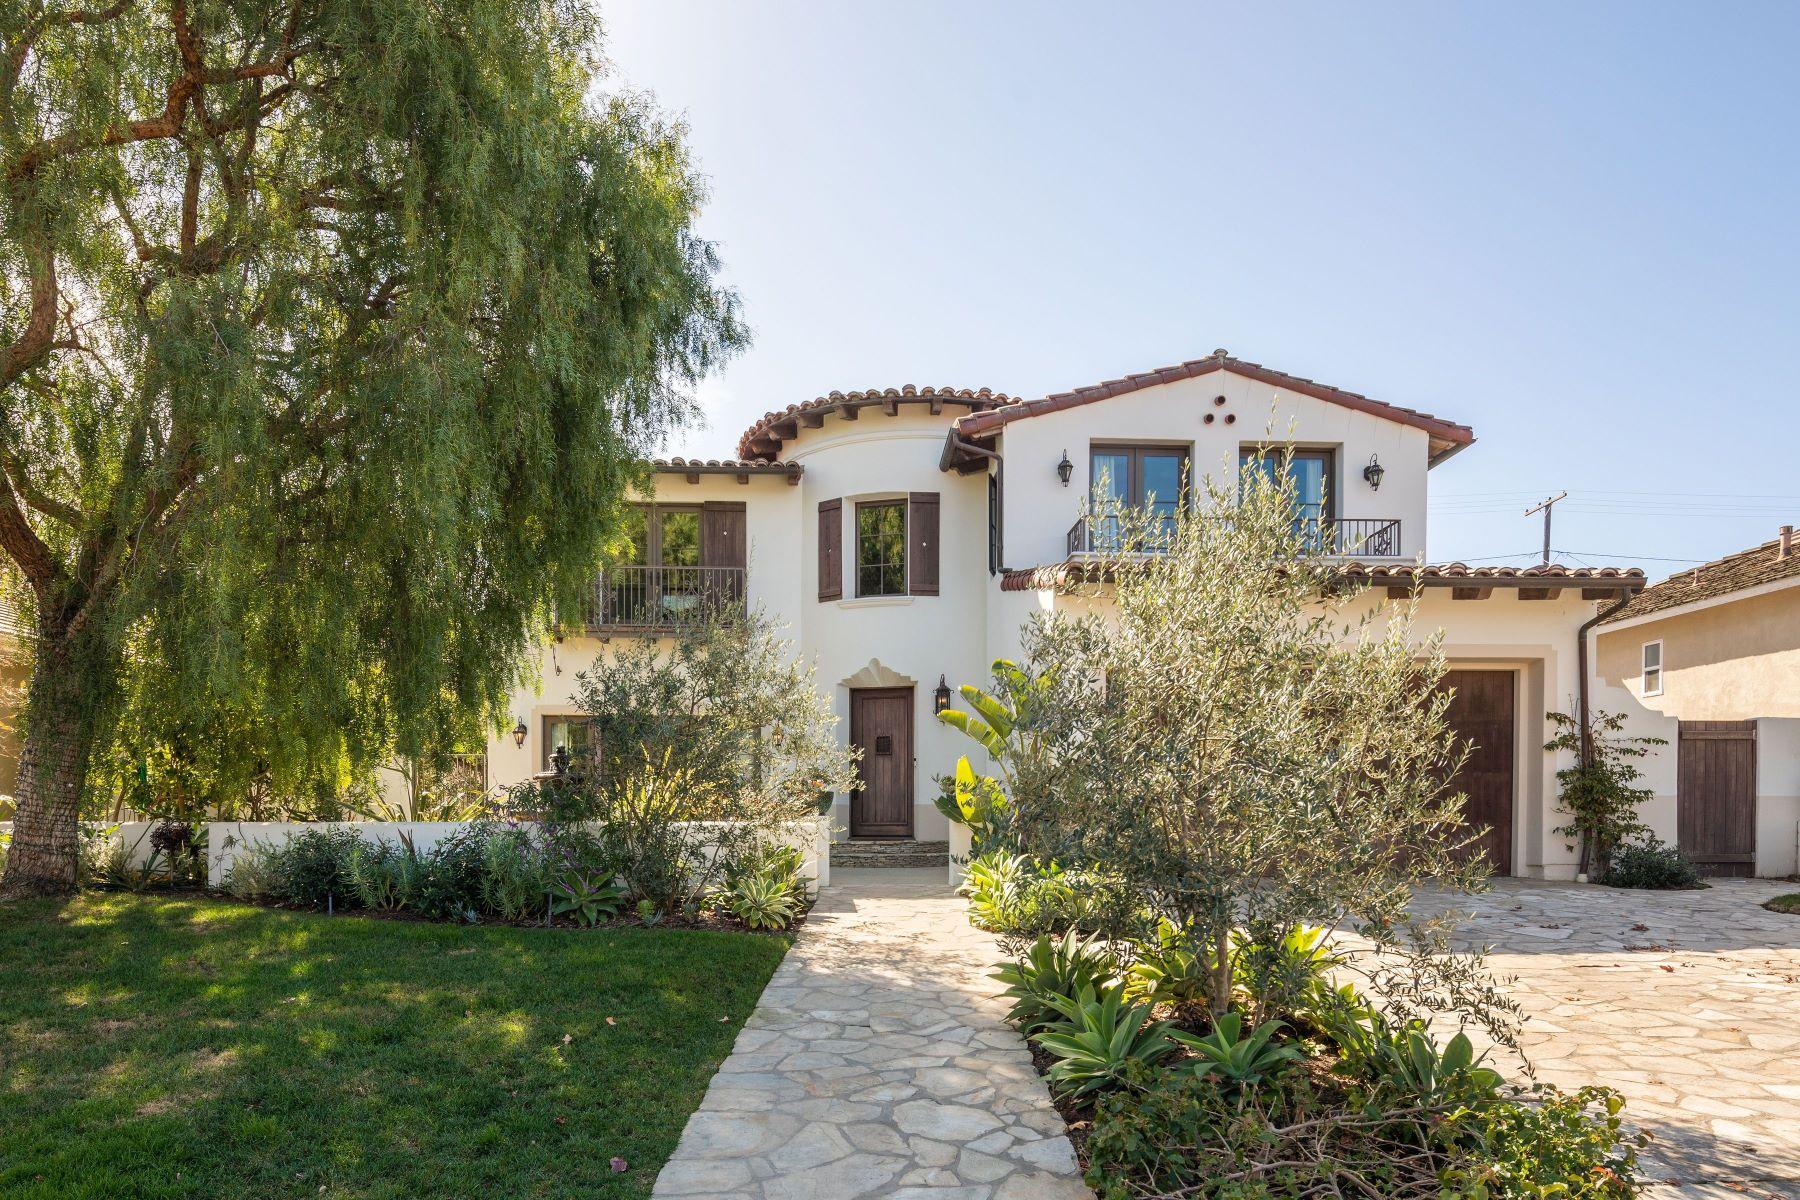 Single Family Homes for Active at 4032 Via Largavista, Palos Verdes Estates, CA 90274 4032 Via Largavista Palos Verdes Estates, California 90274 United States